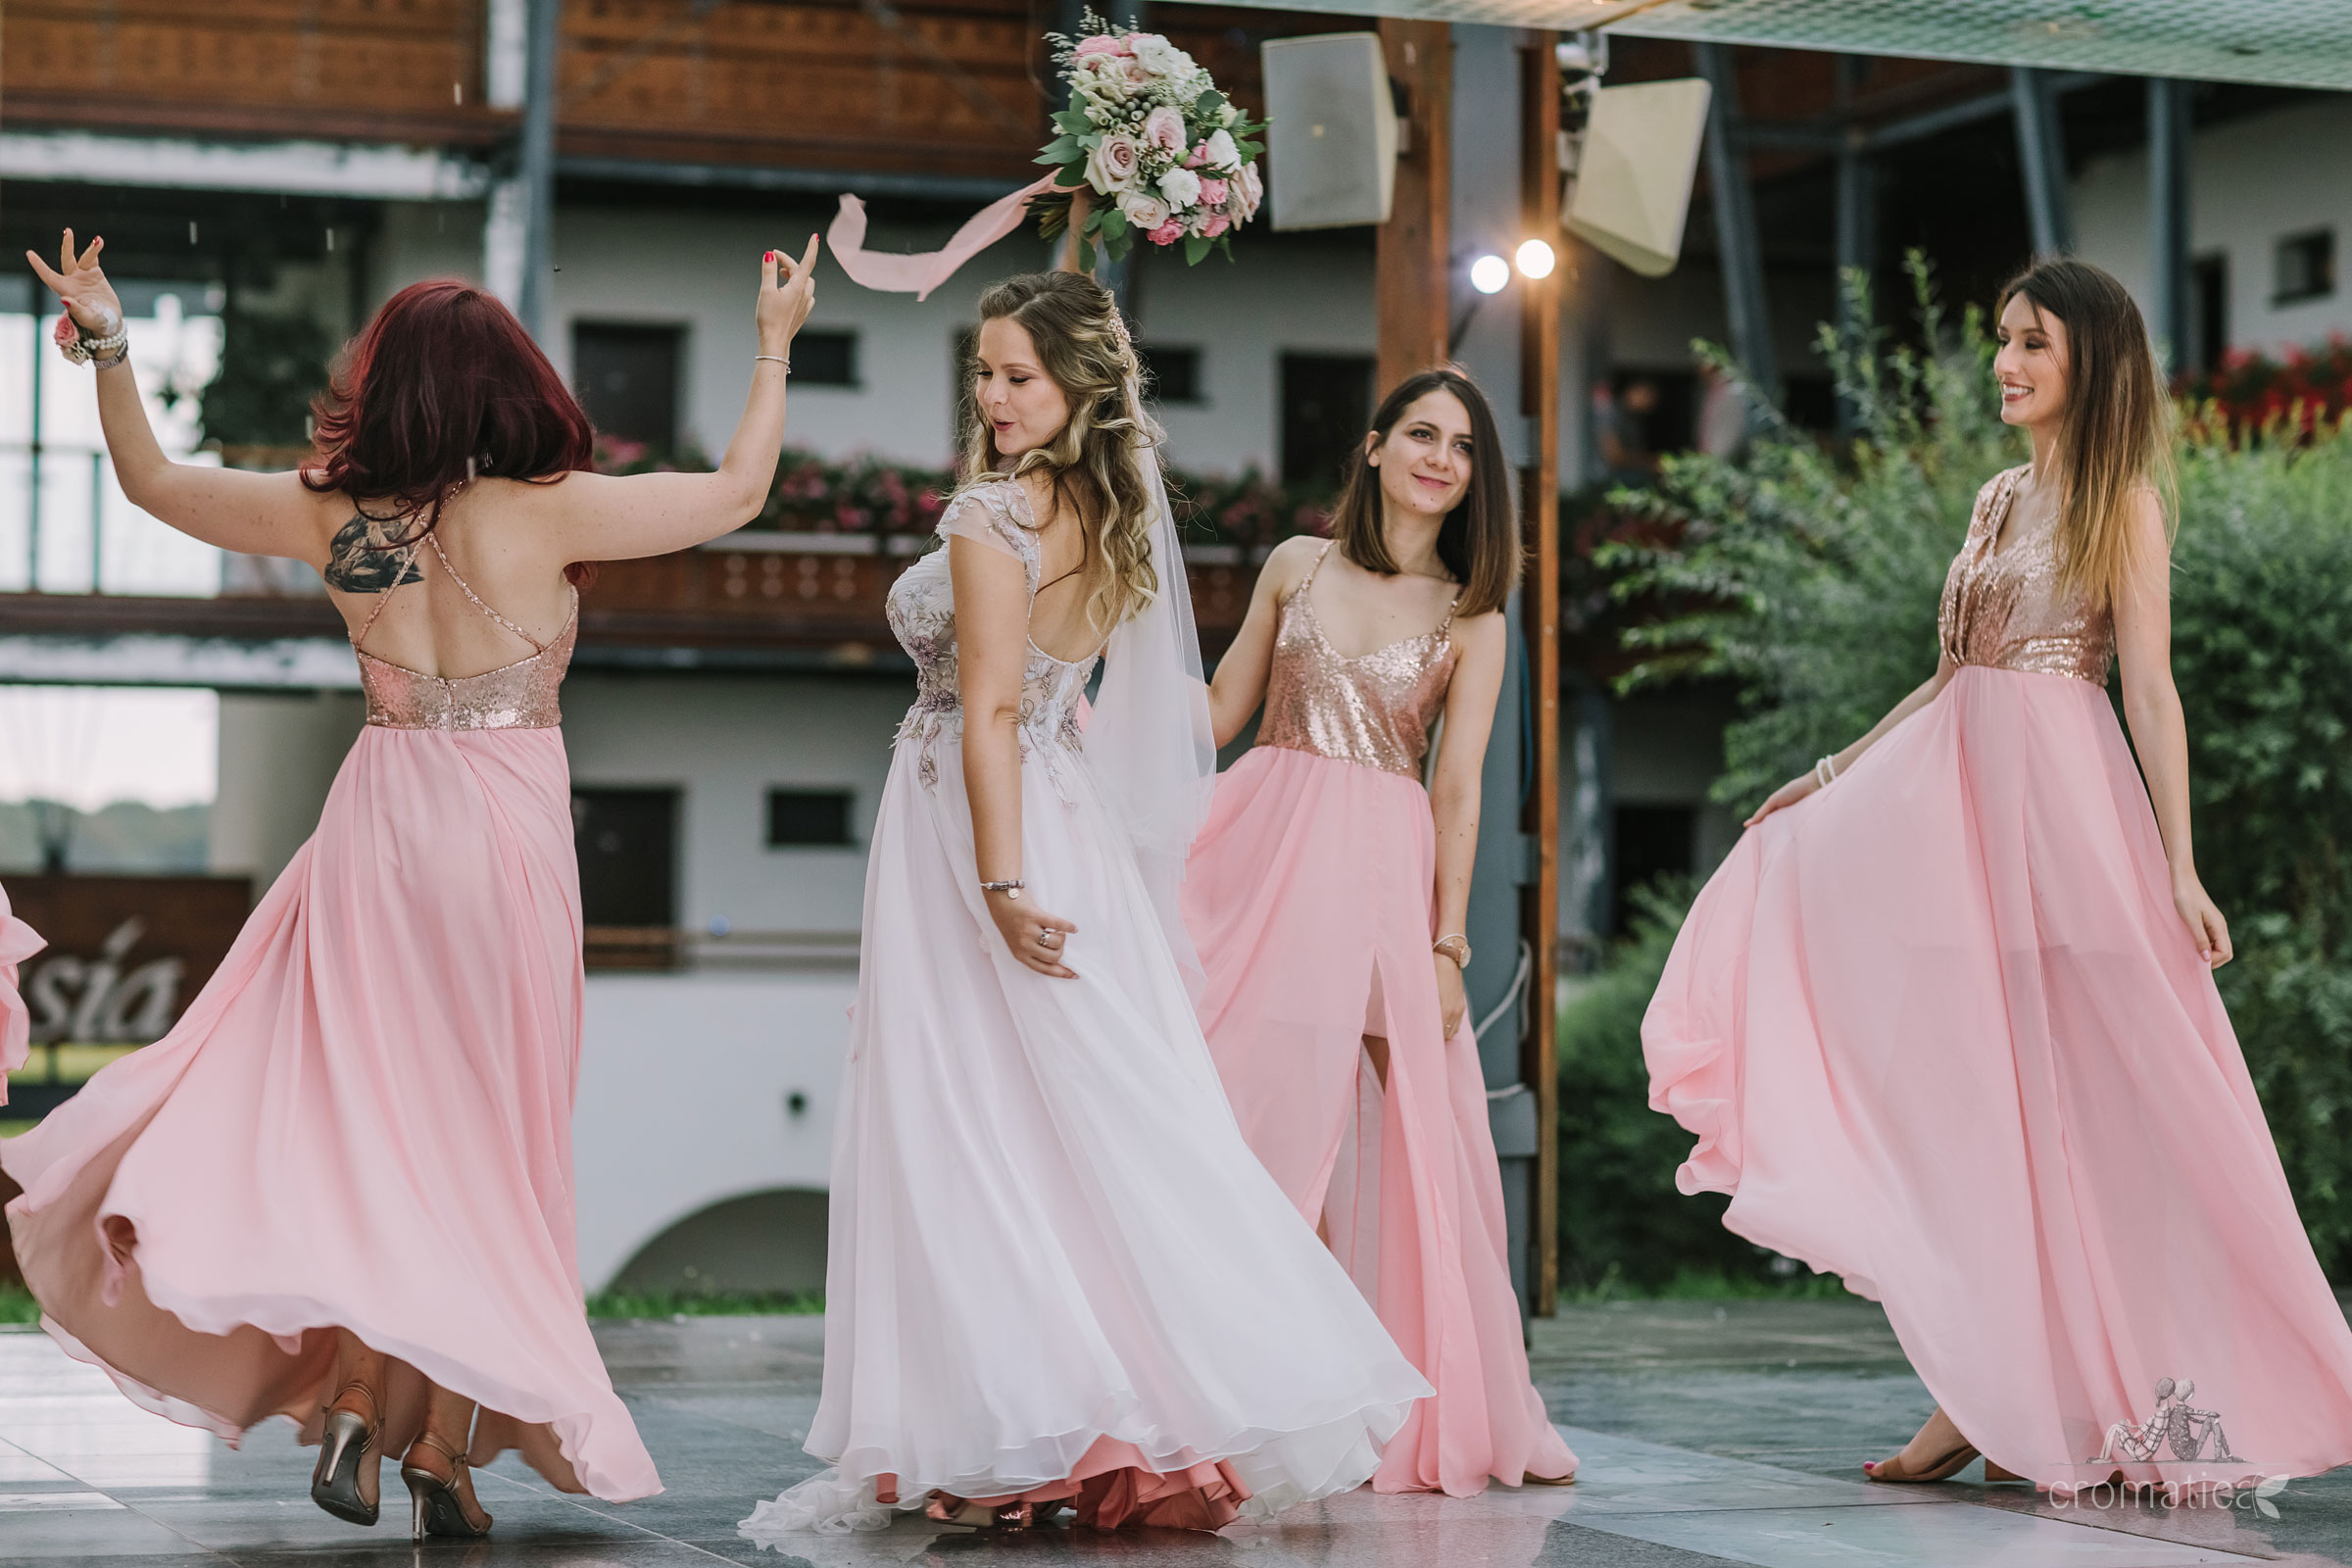 alexandra george fotografii nunta casa vlasia 074